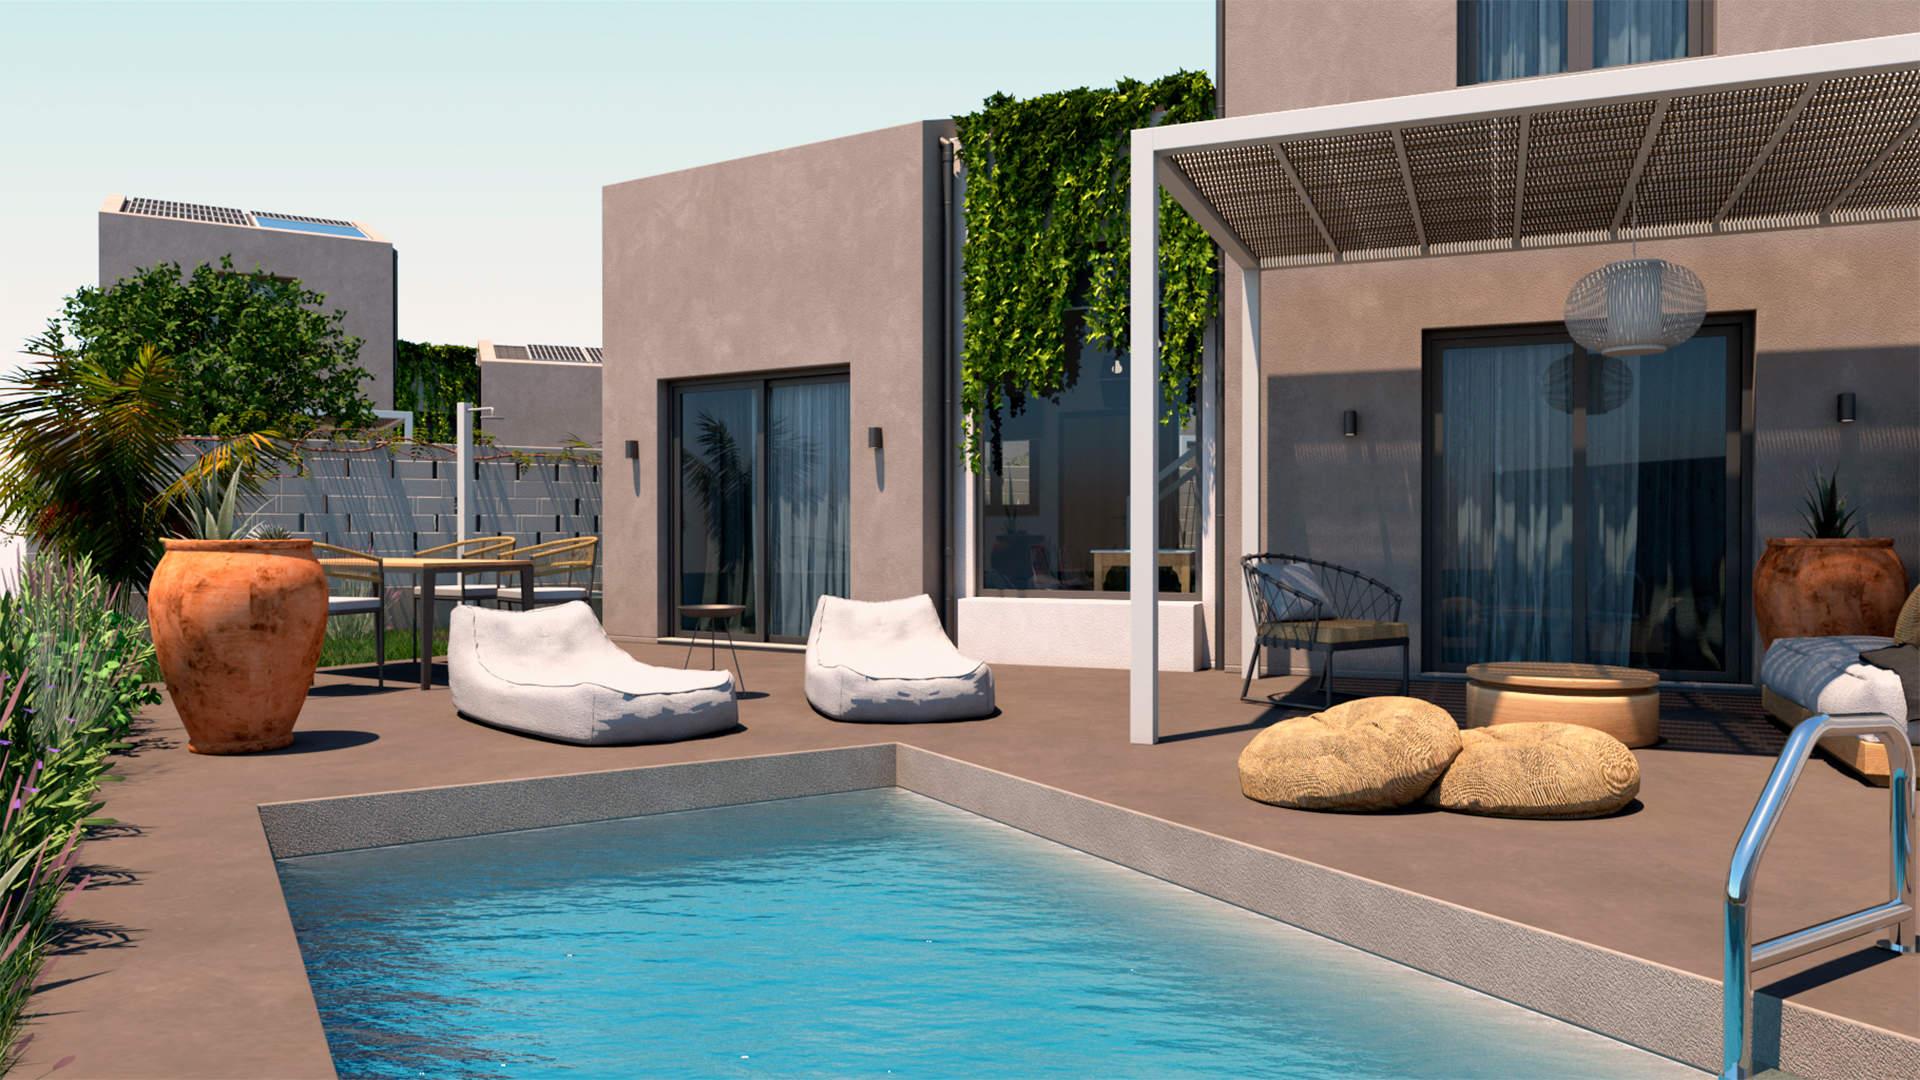 villas complex, exterior design,private outdoor space and pool, landscaping. Συγκρότημα τουριστικών κατοικιών, εξωτερικές διαμορφώσεις, ιδιωτική πισίνα, ιδιωτική αυλή.